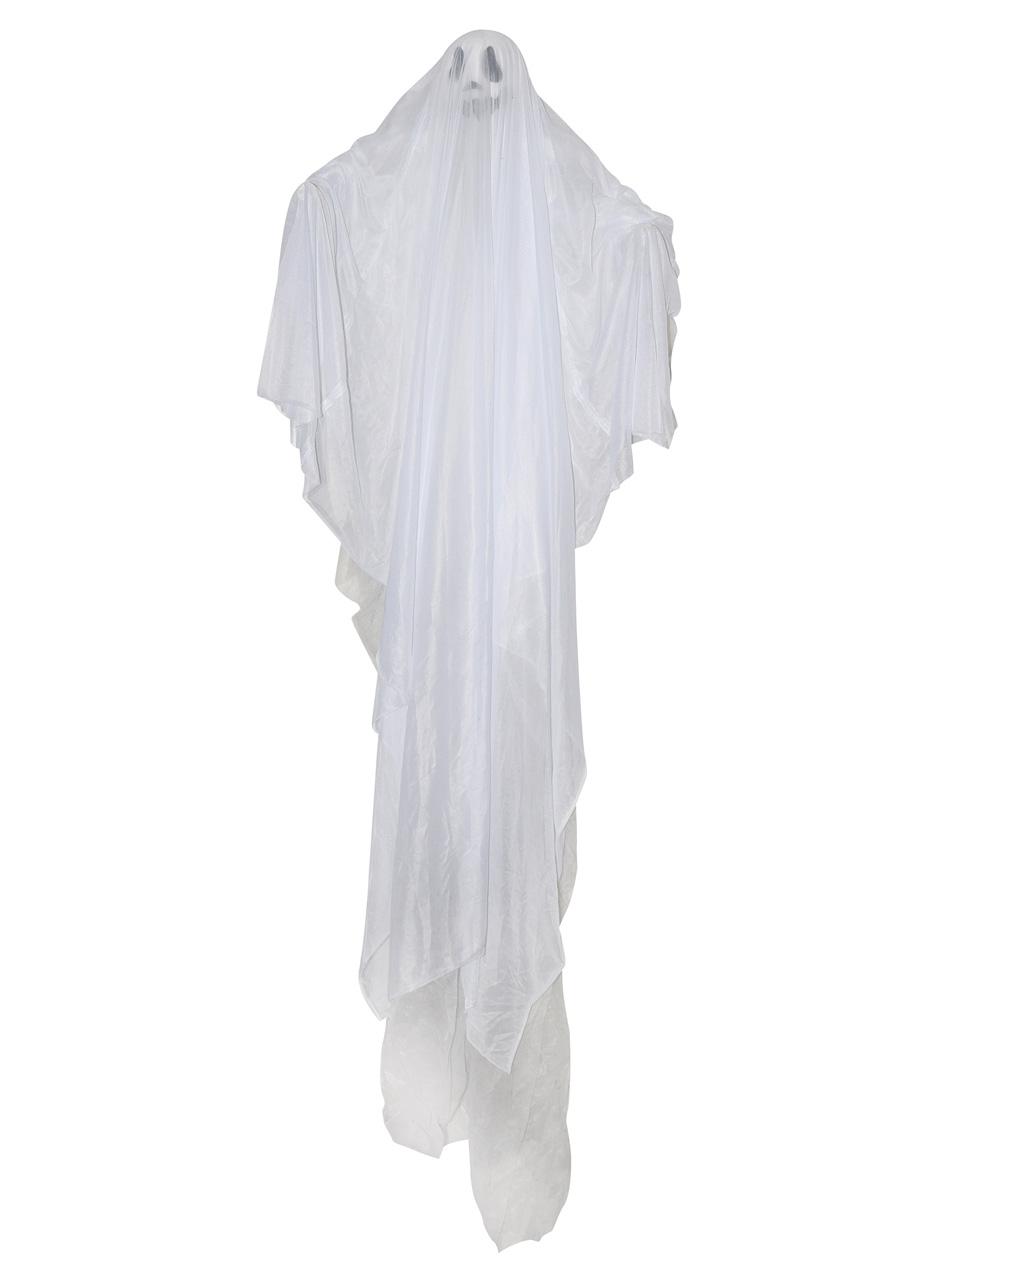 White Ghost Halloween Hanging Figure 18 Cm